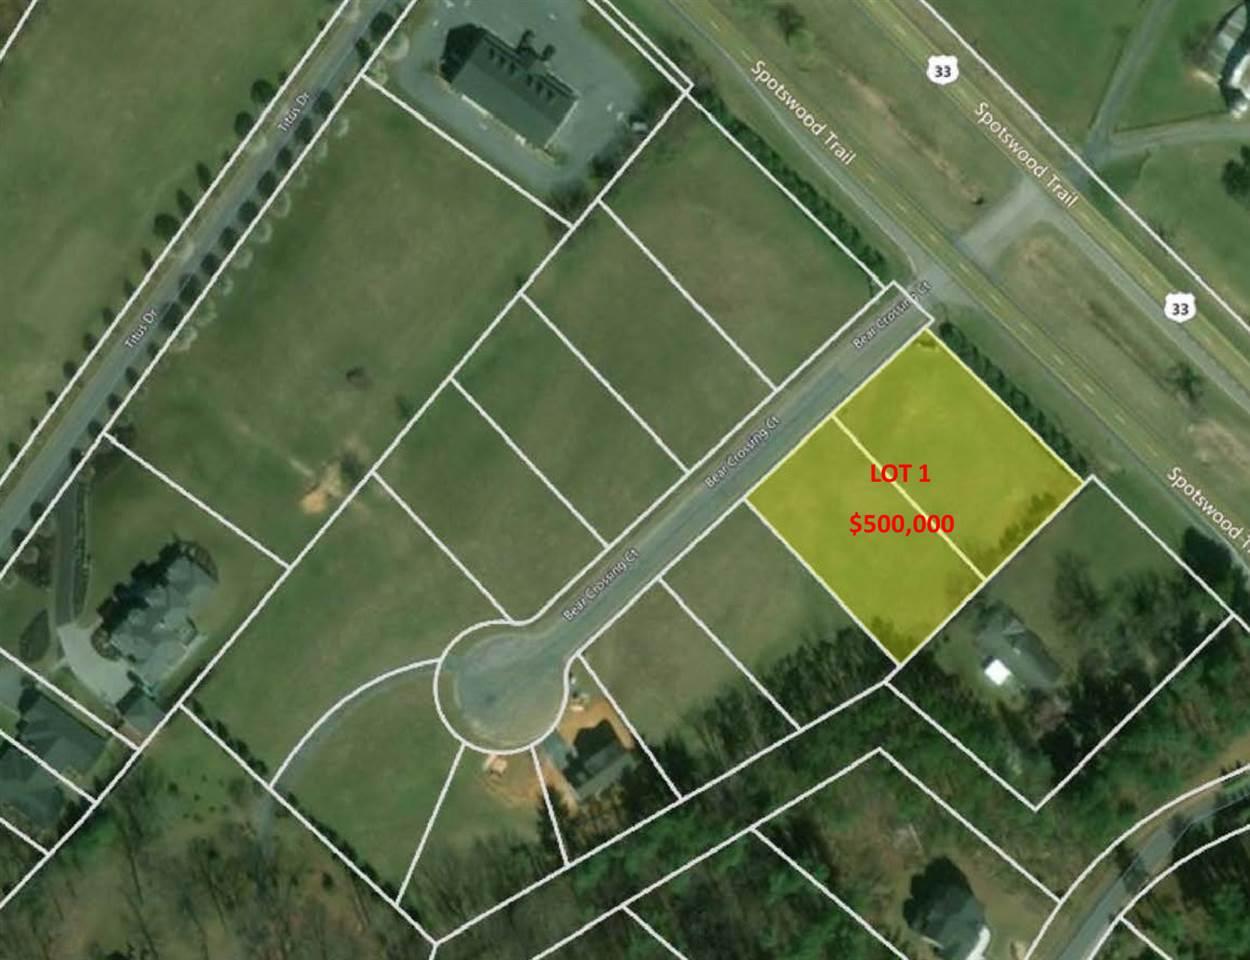 Lot 1-2 BEAR CROSSING CT, PENN LAIRD, VA 22846